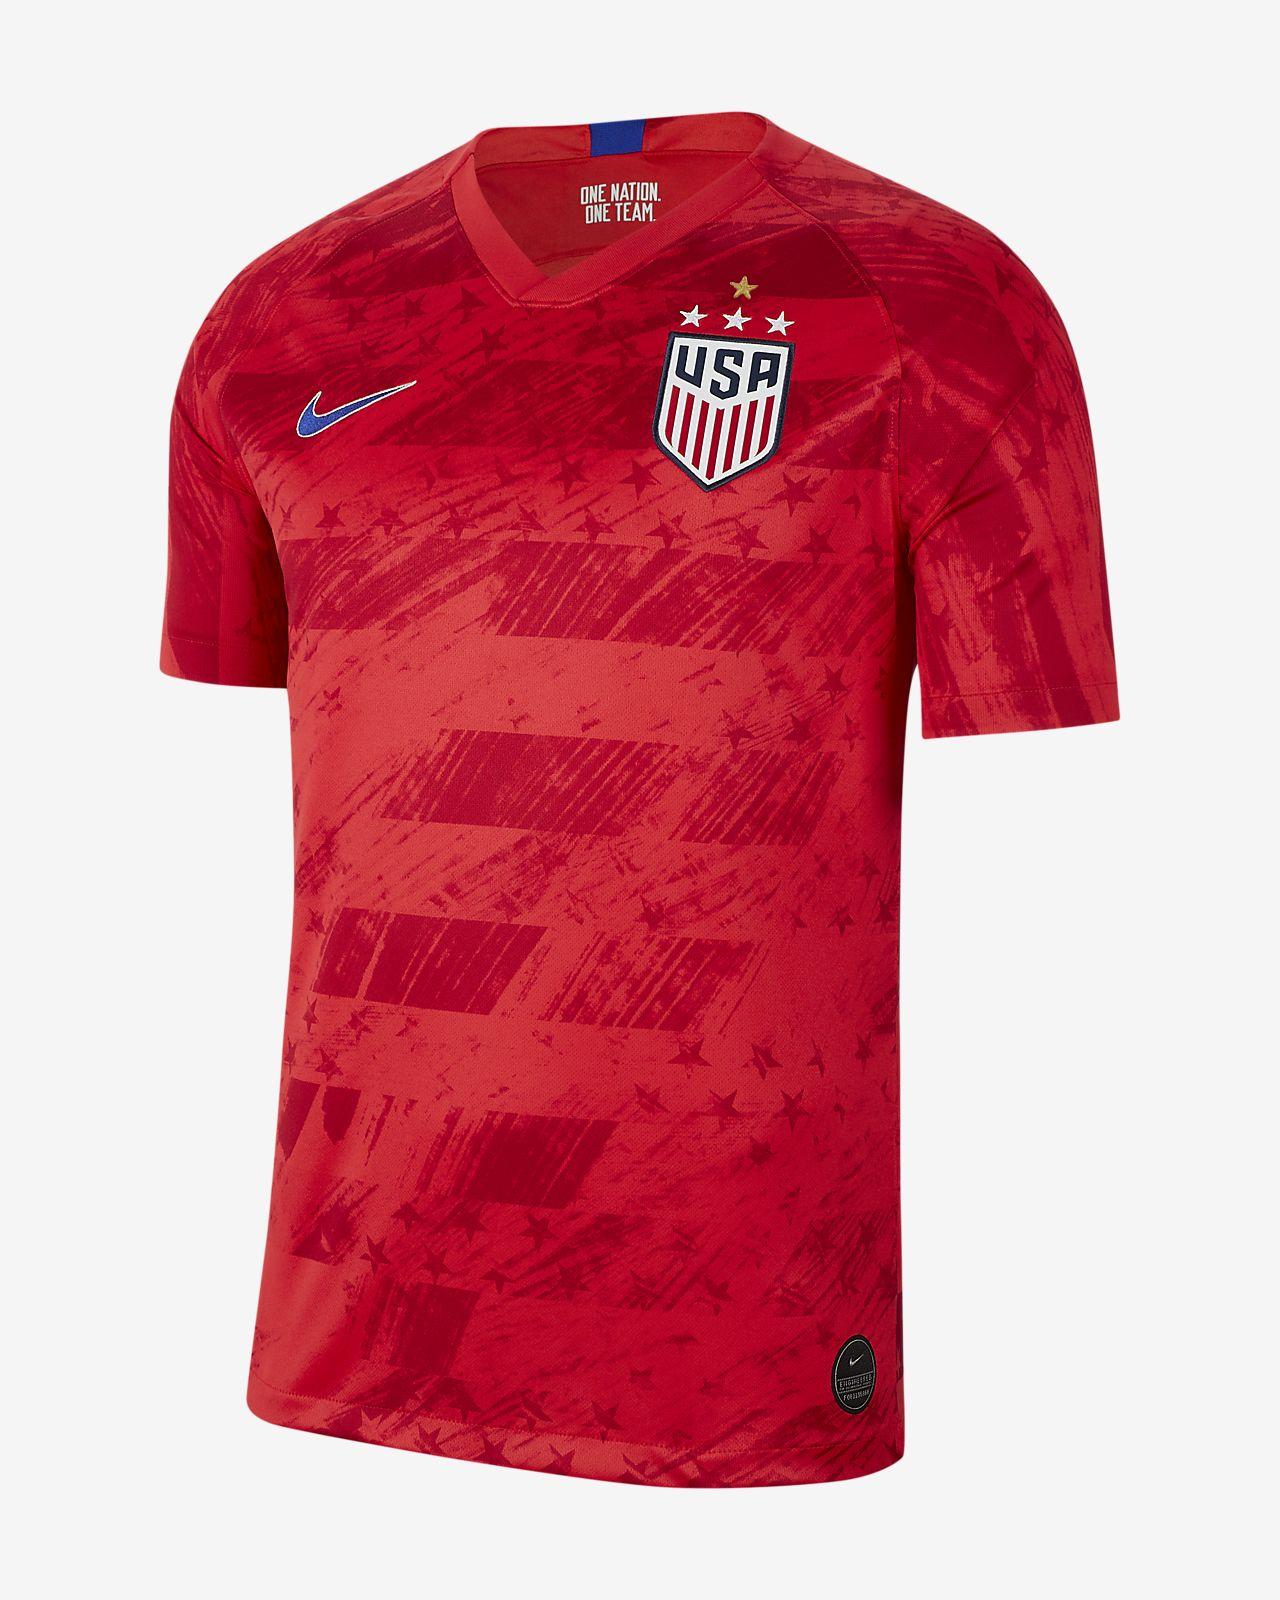 U.S. 2019 Stadium Away (4-Star) Men's Soccer Jersey